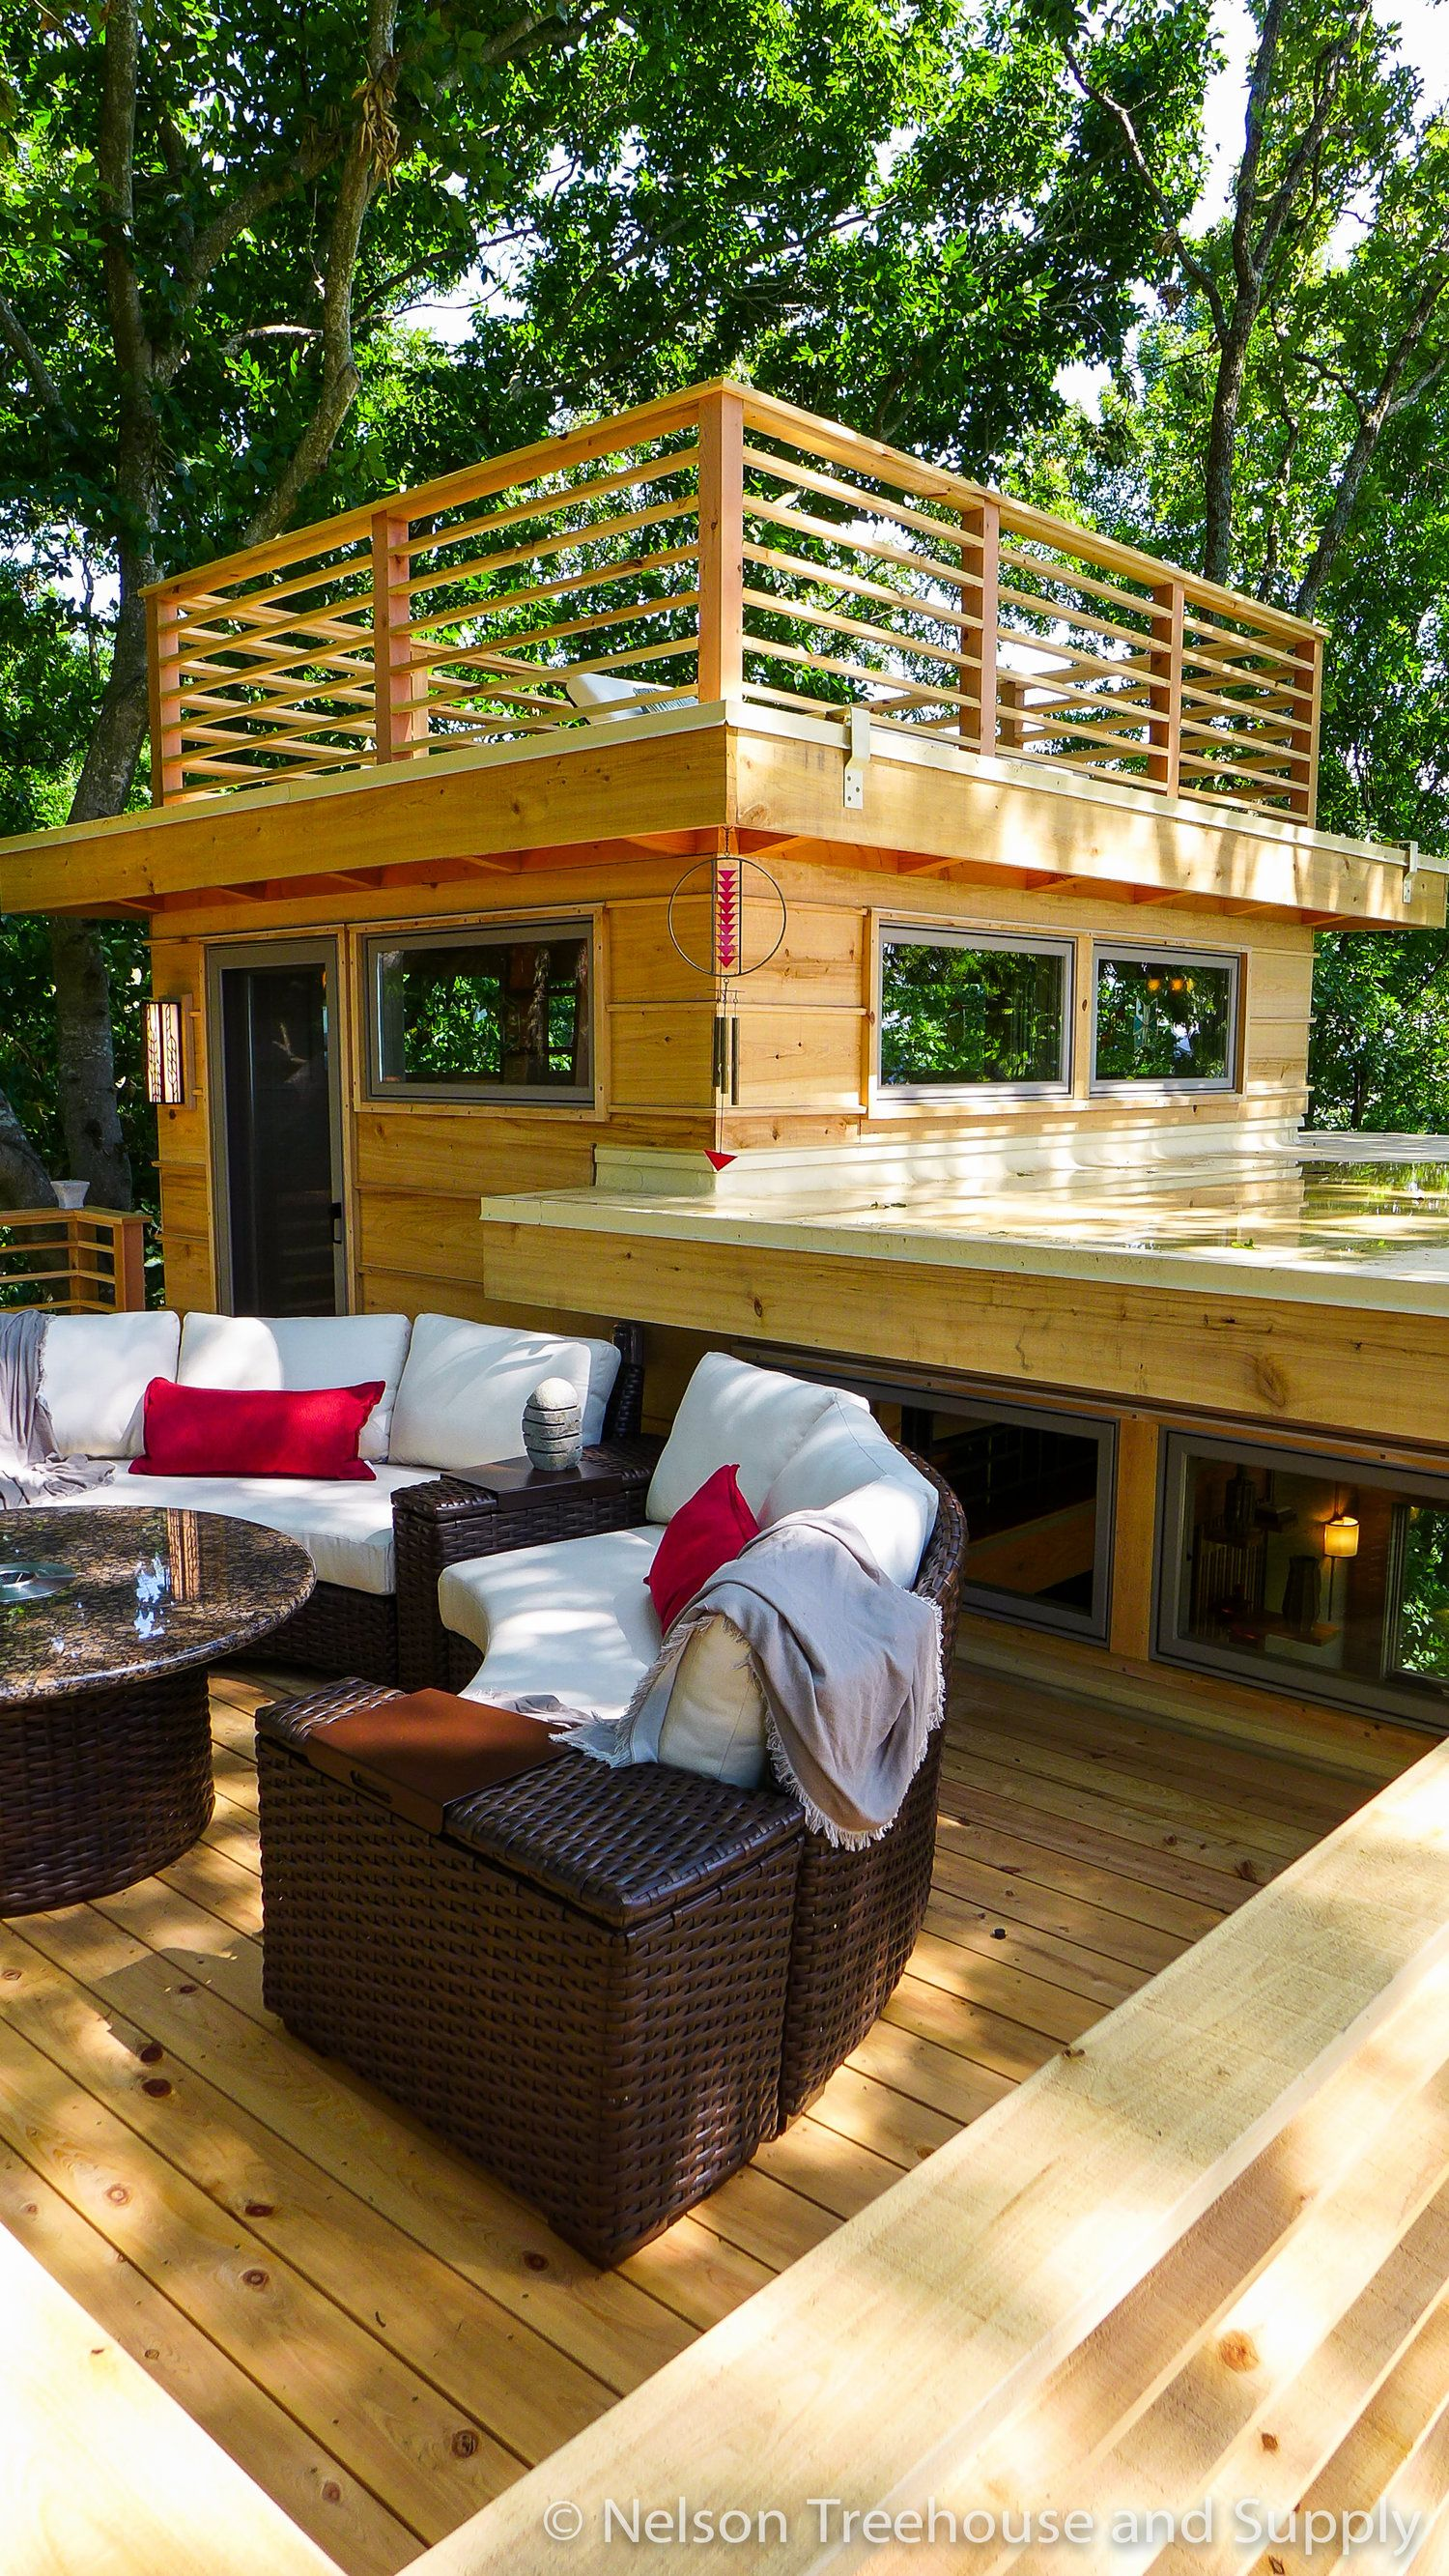 frank-lloyd-wright-treehouse-sun-roof | Tree house | Pinterest